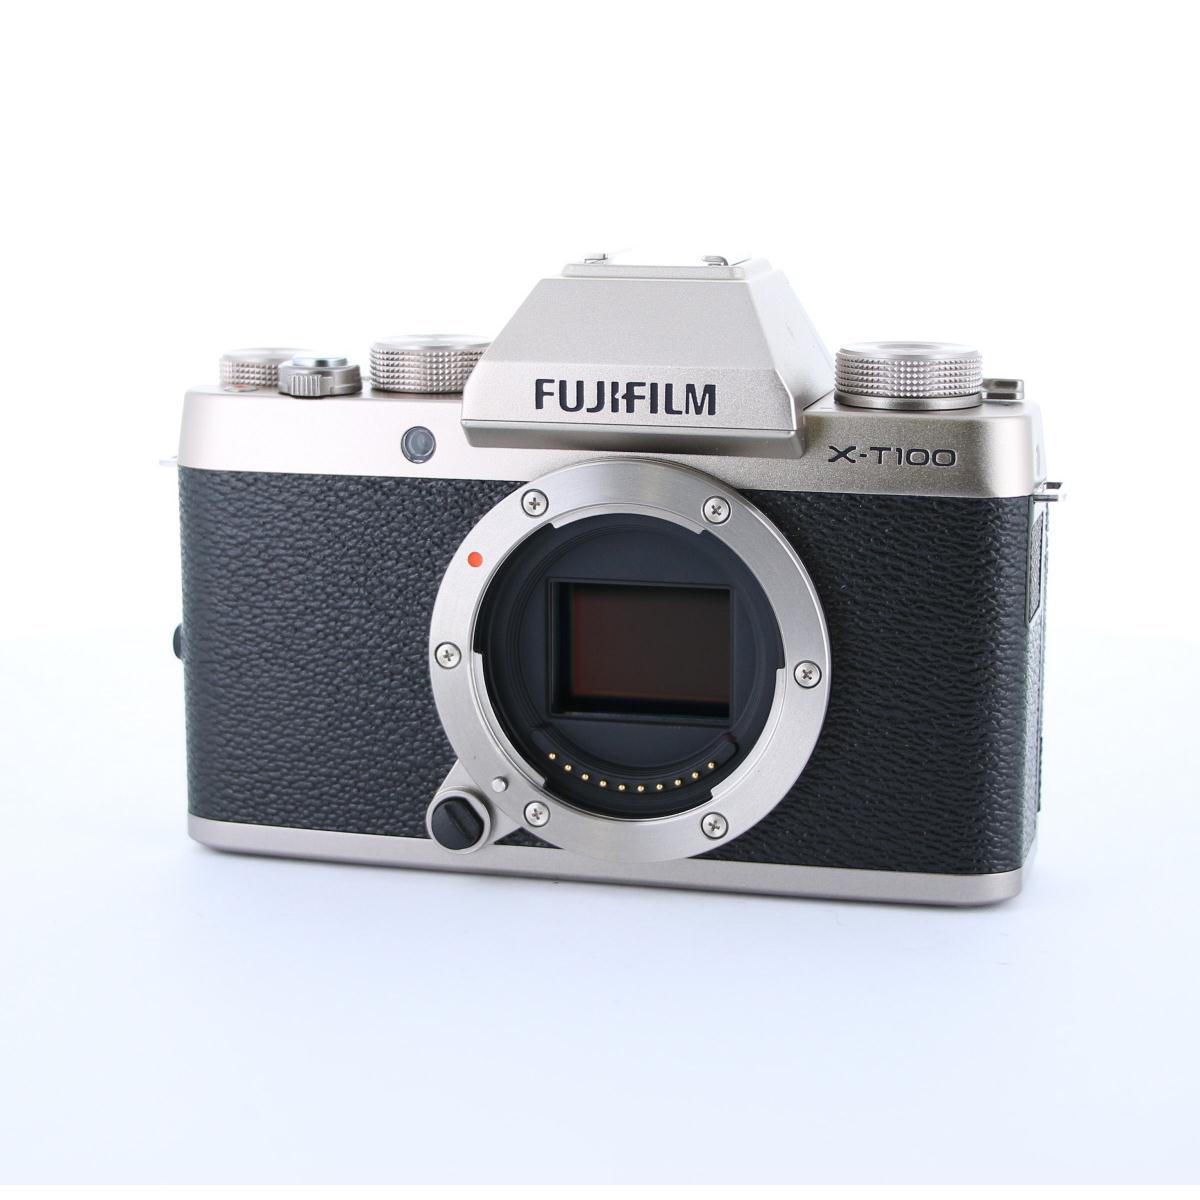 FUJIFILM X-T100【中古】